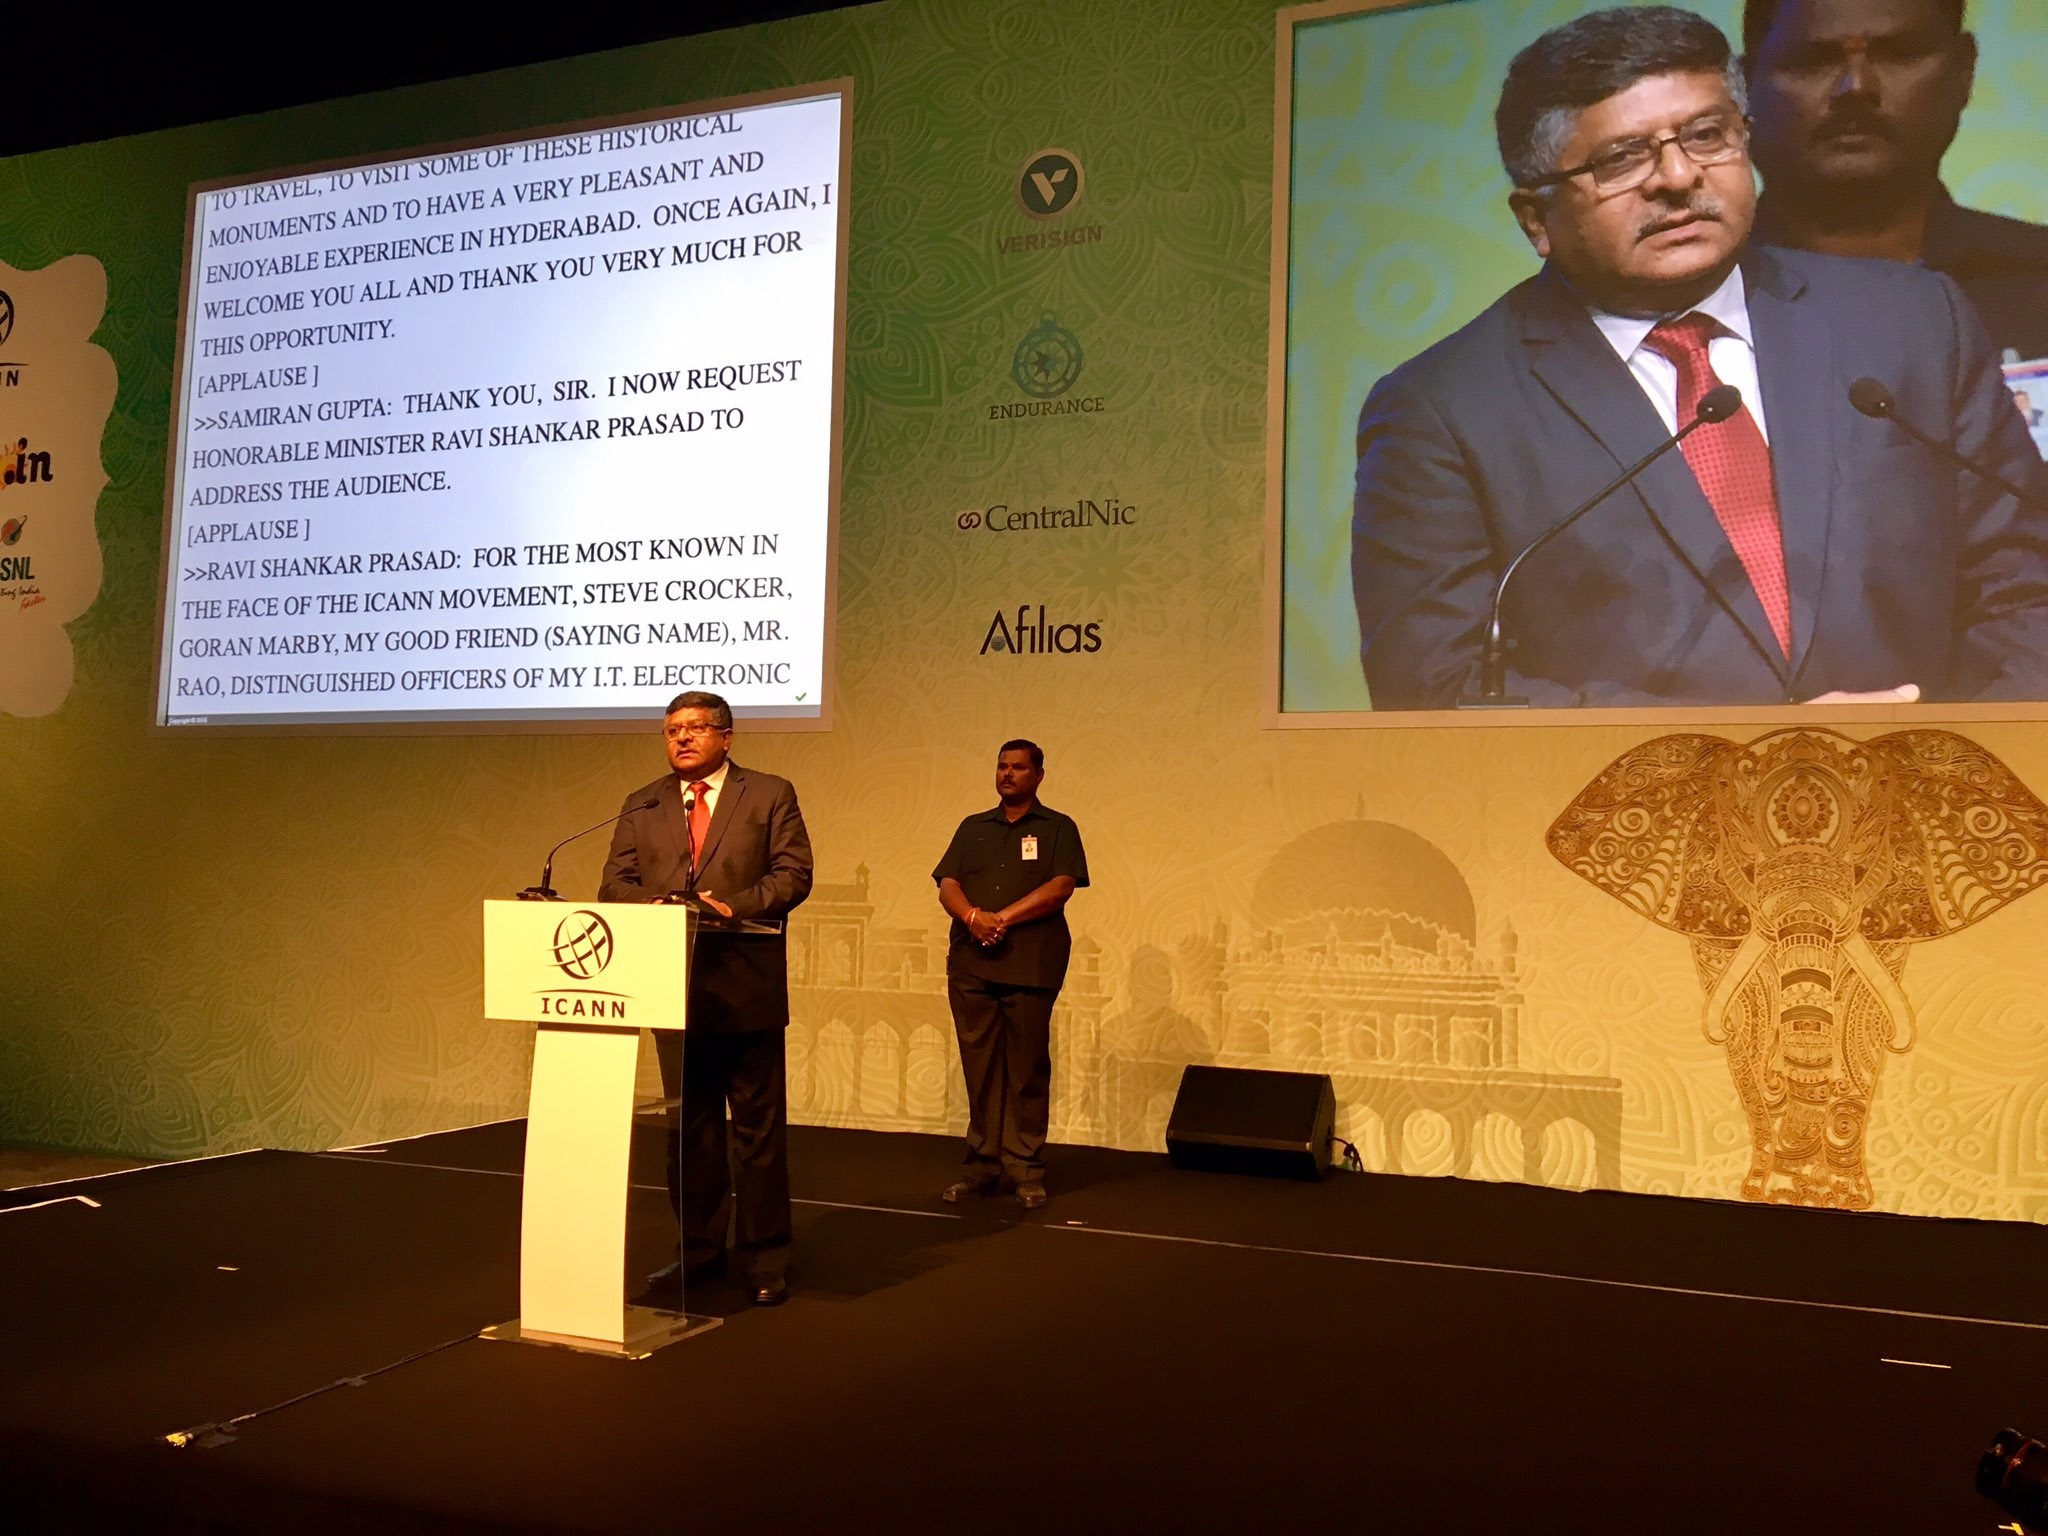 Ravi Shankar Prasad Walks the Multistakeholder Line in Hyderabad, But It Doesn't Extend to Delhi